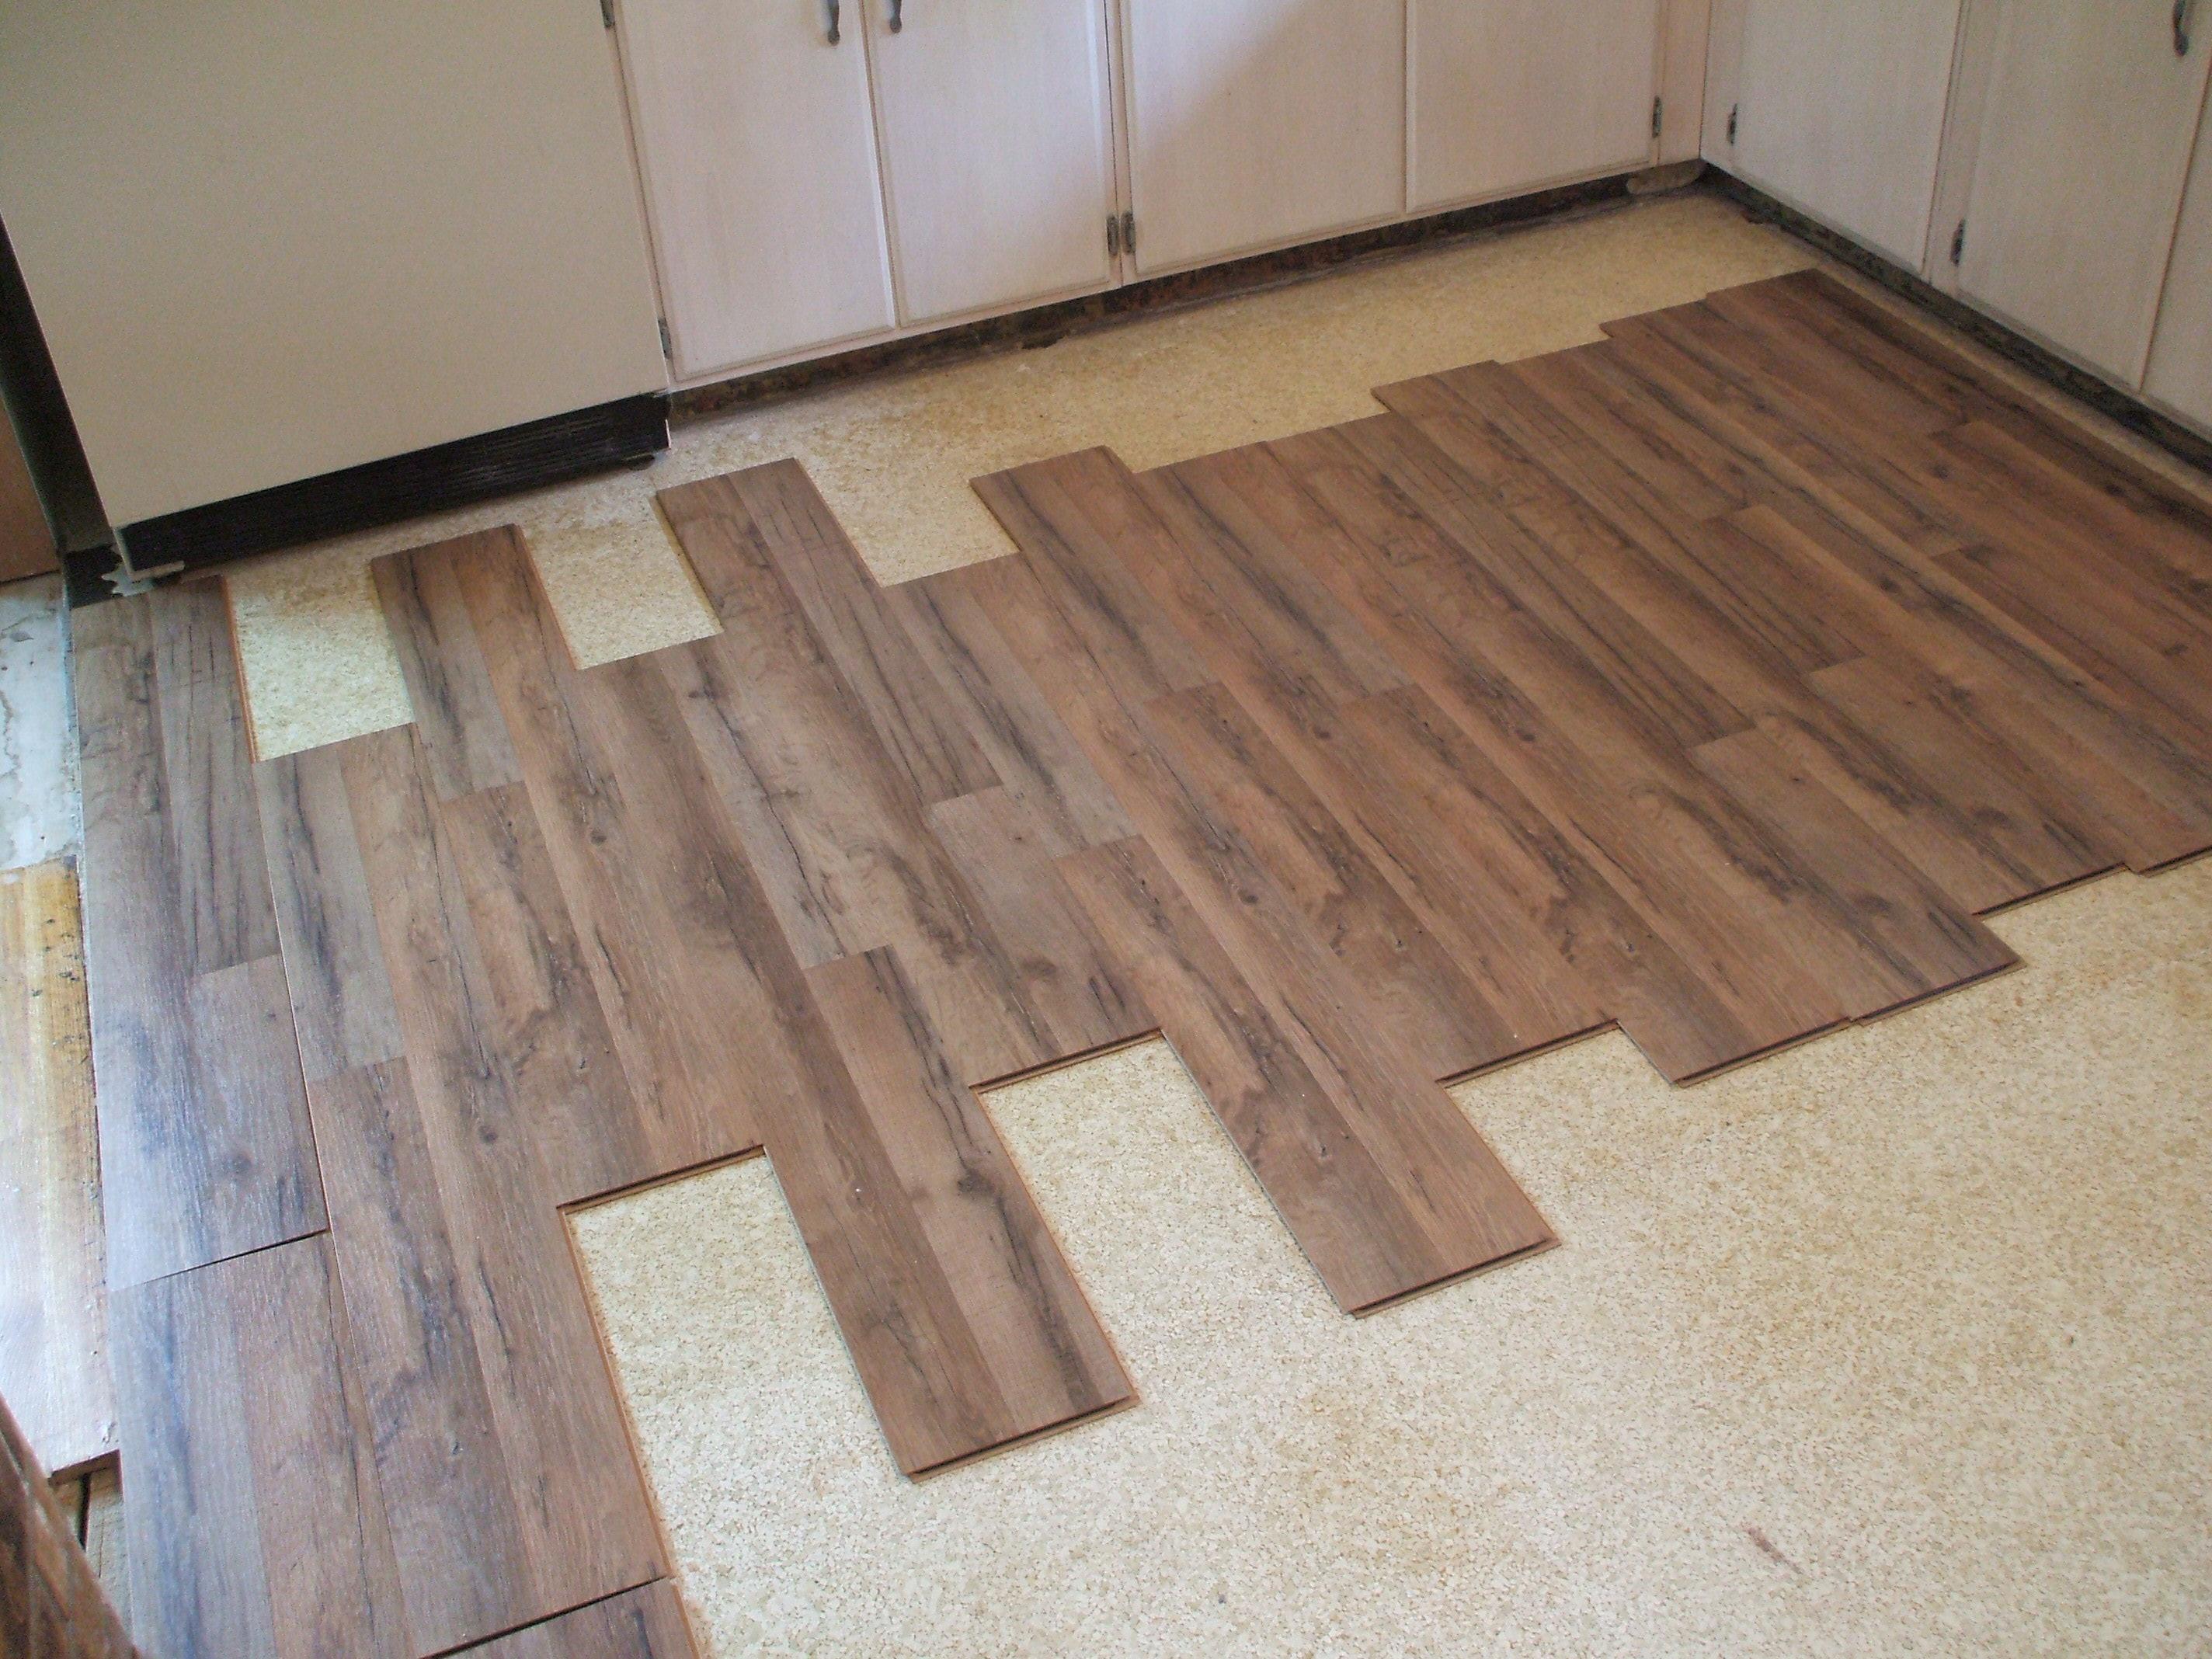 bruce engineered hardwood floors of 14 new home depot bruce hardwood photograph dizpos com with 29 inspirational s bruce hardwood and laminate floor cleaner